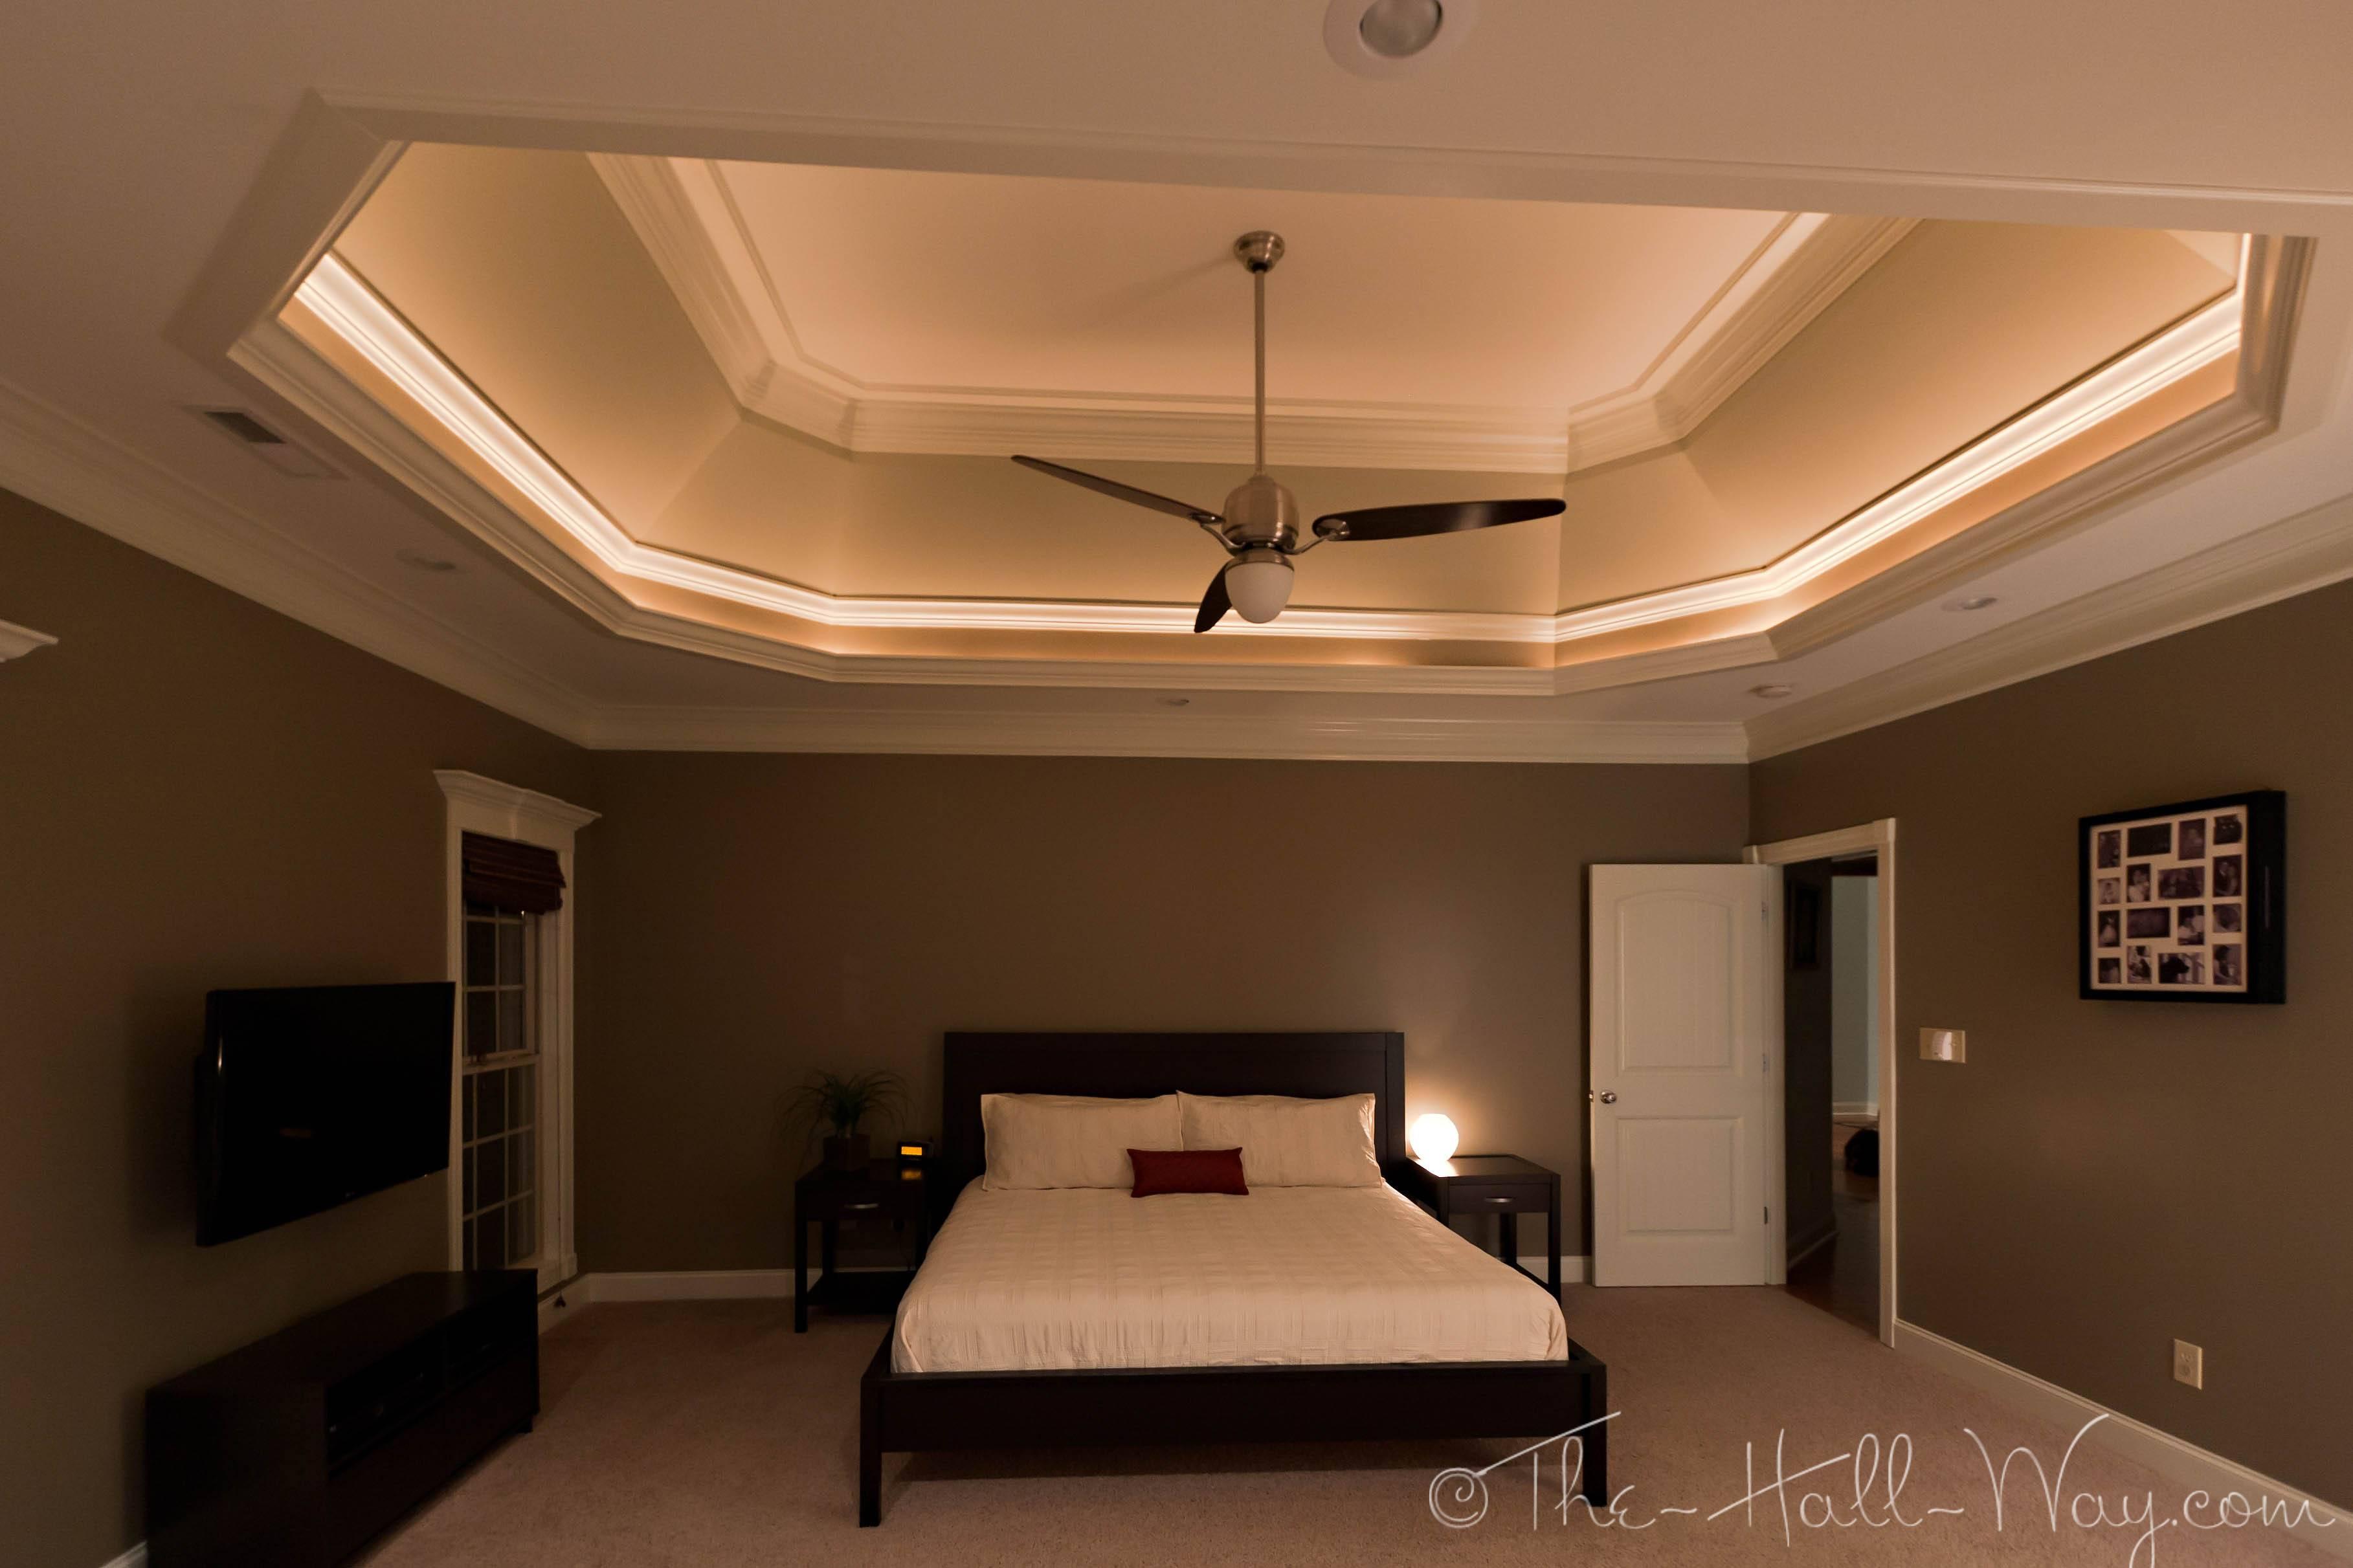 Room Master Bedroom Had Rope Lights